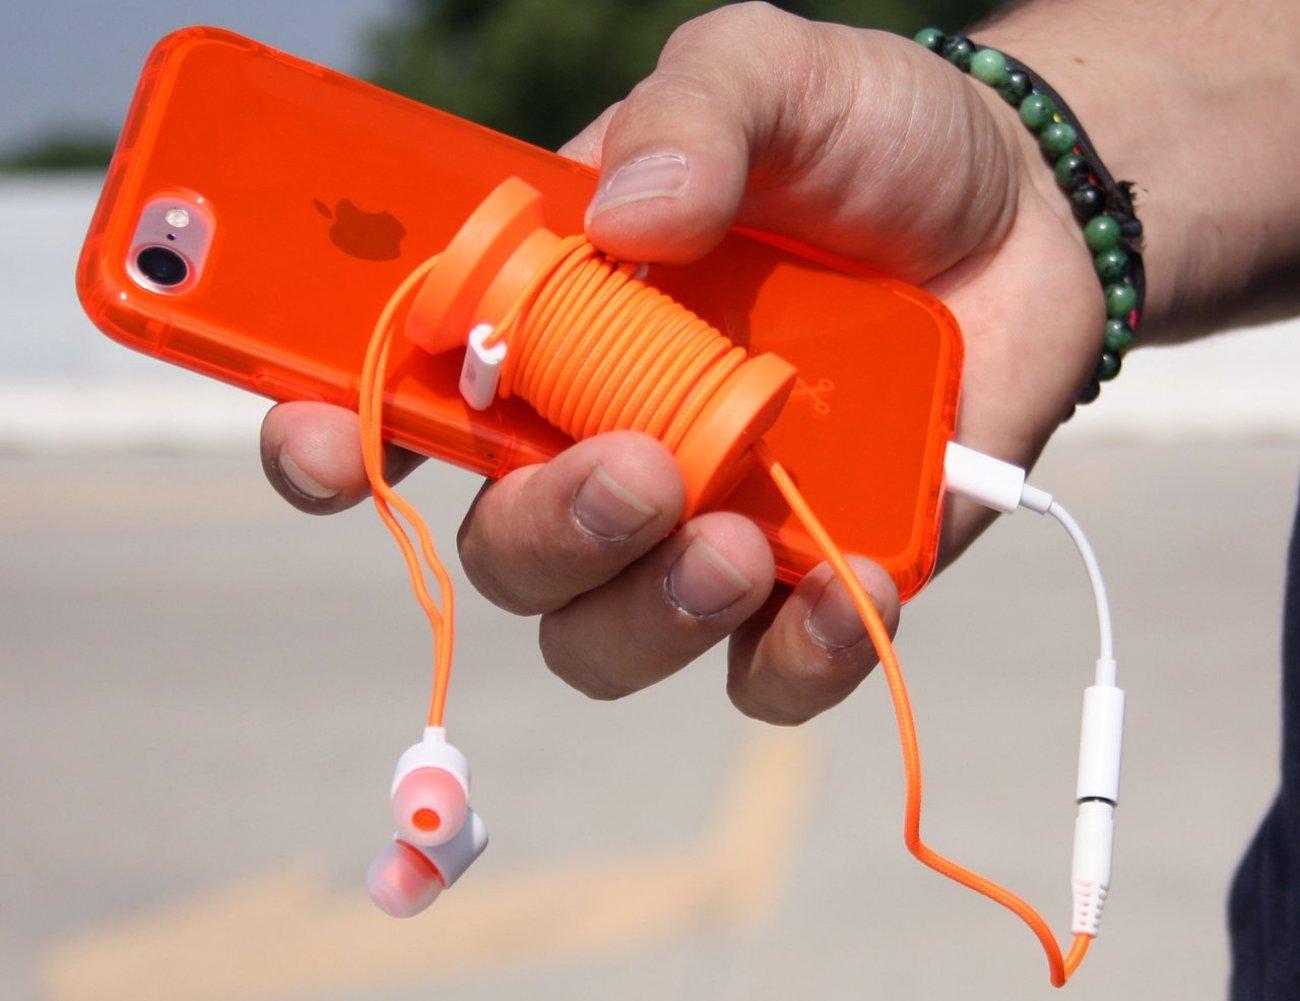 Spool Cable Organizing Earphones